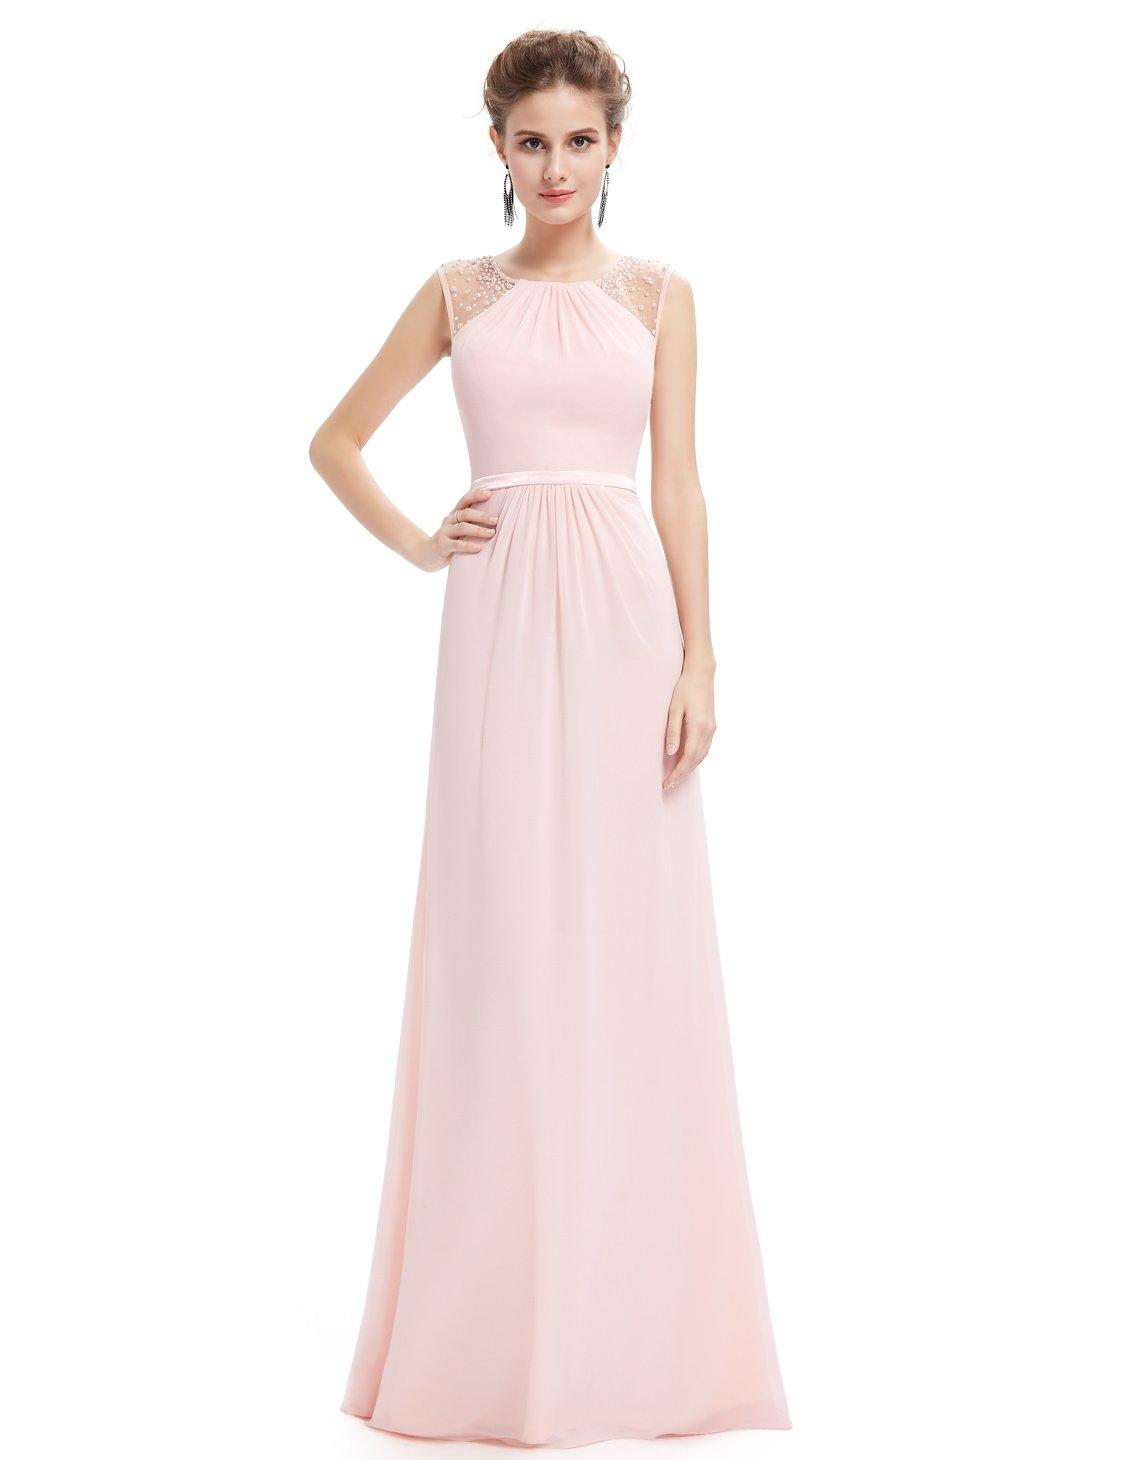 Ever-Pretty Womens Floor Length Long Chiffon Prom Dress 6 US Pink